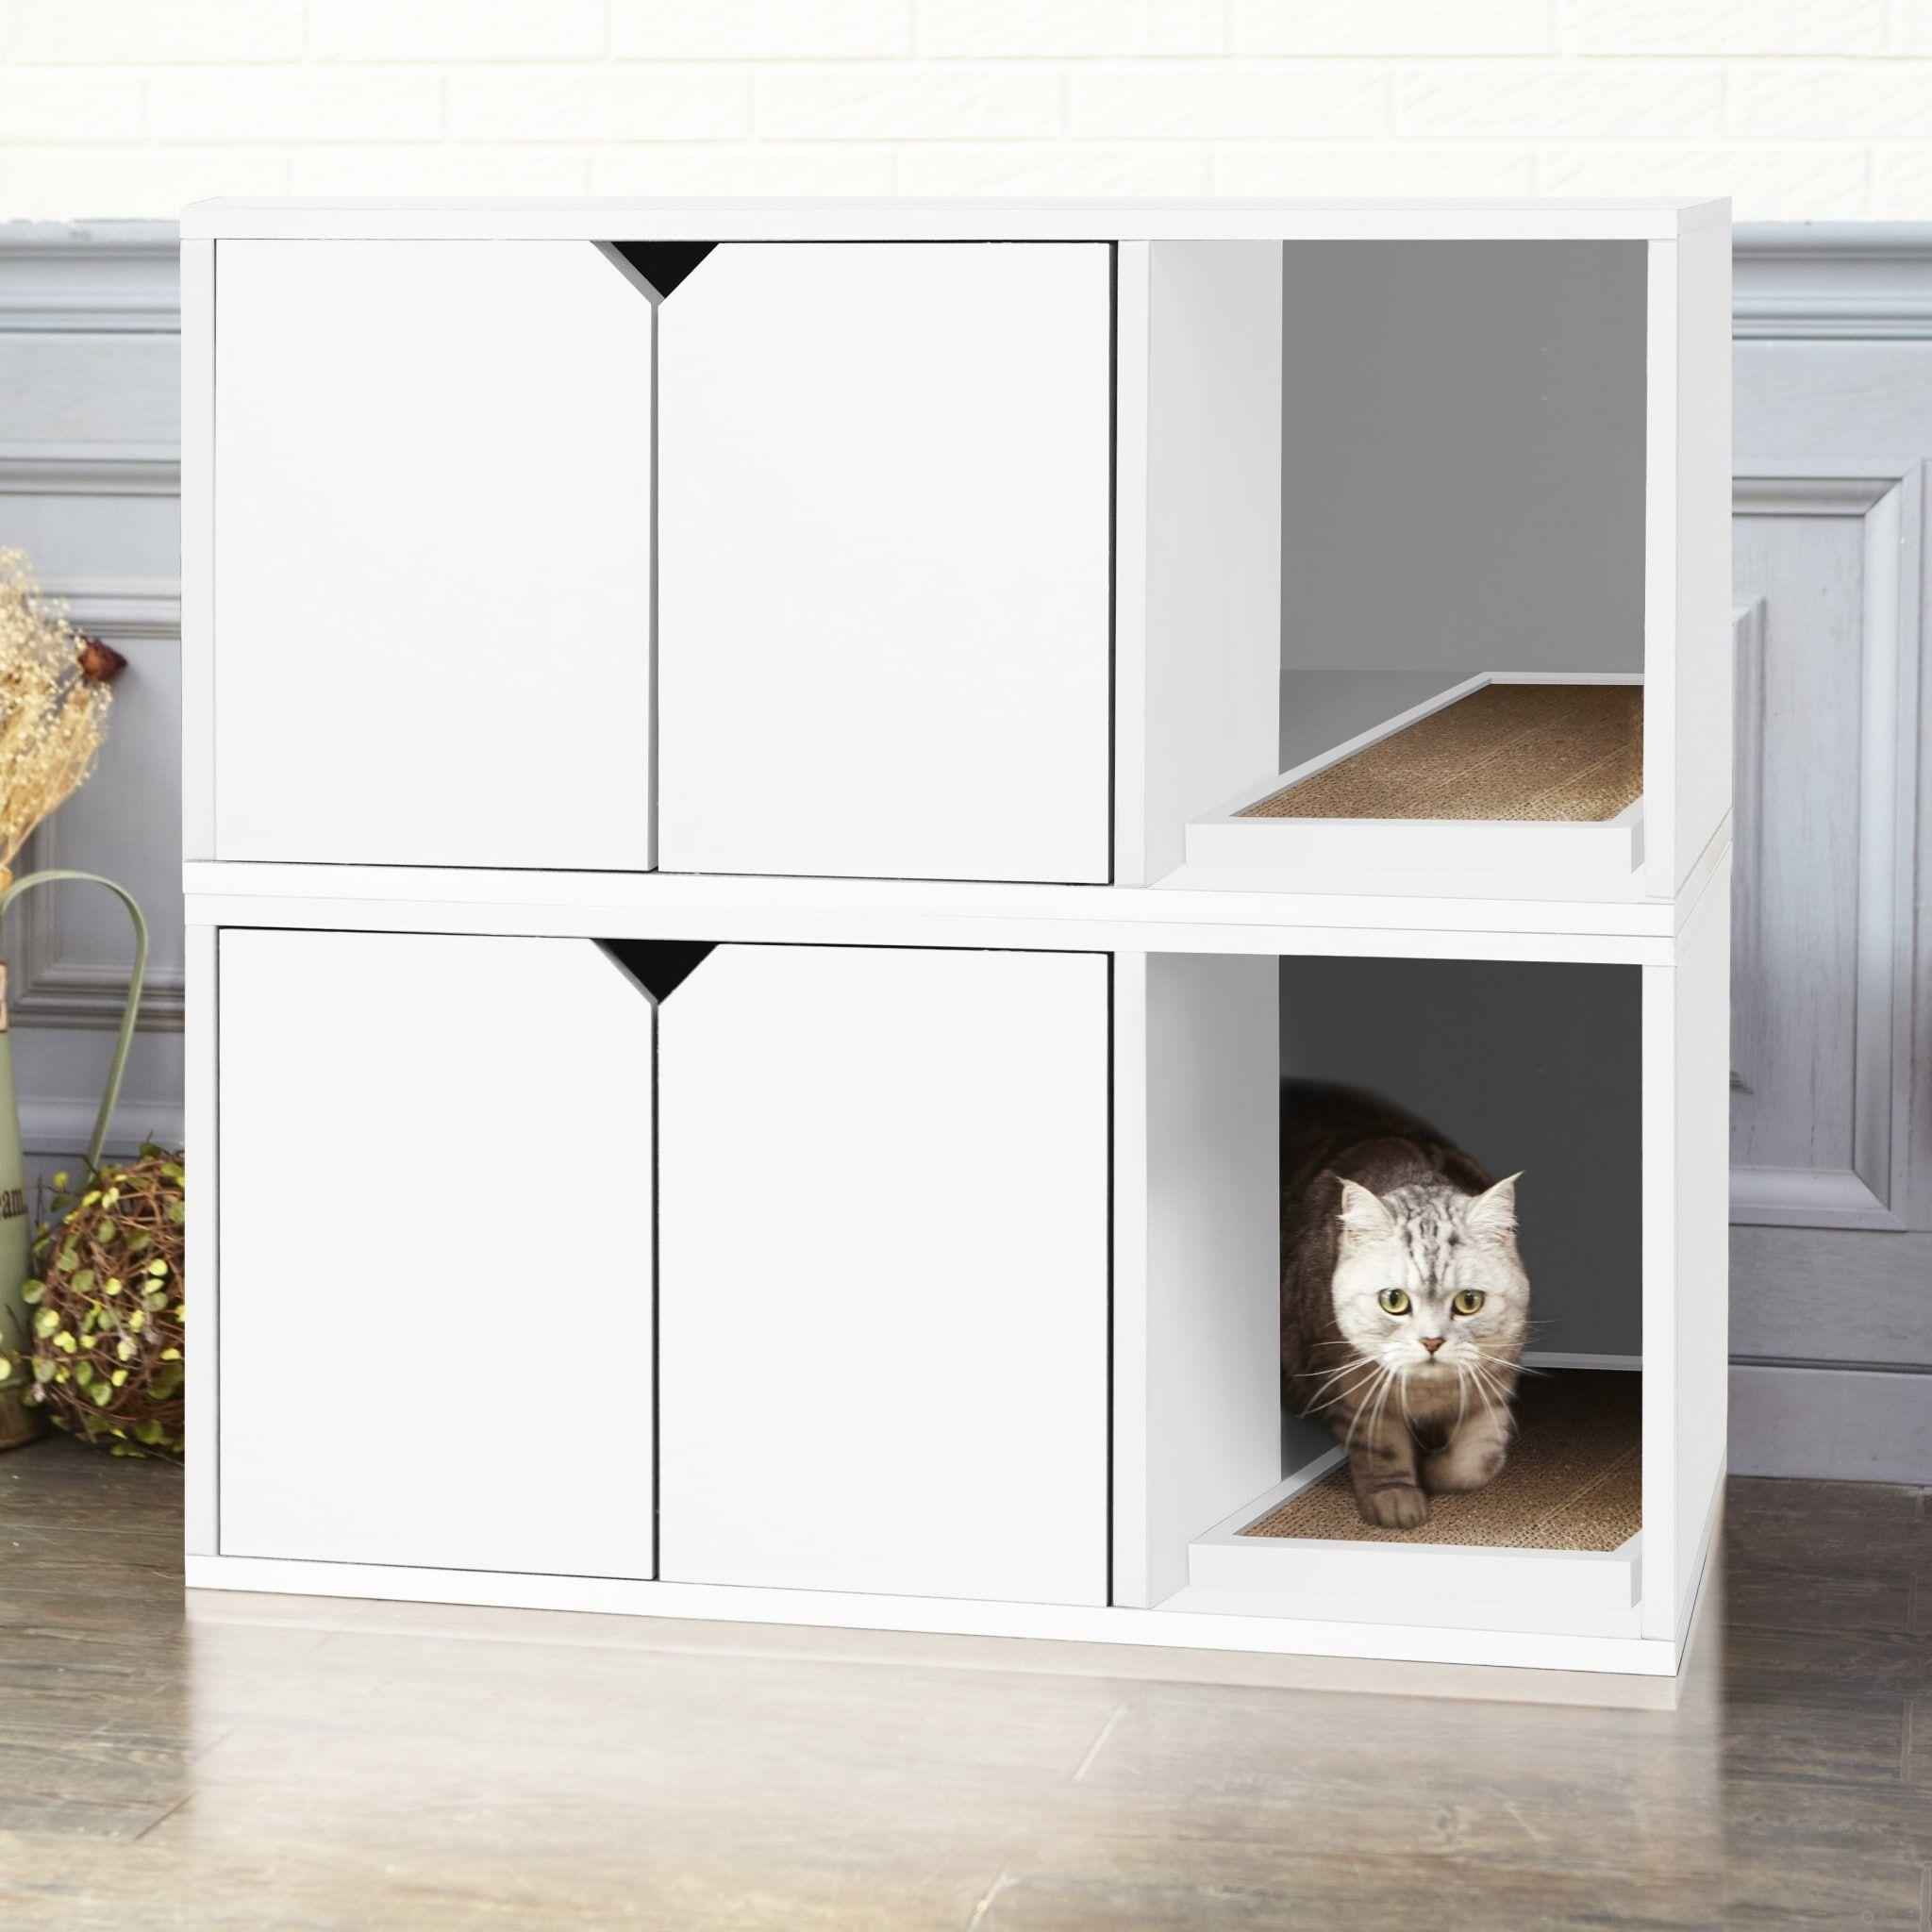 Way Basics White Eco Modern Double Cat Litter Box Furniture With Lifetime Guarantee